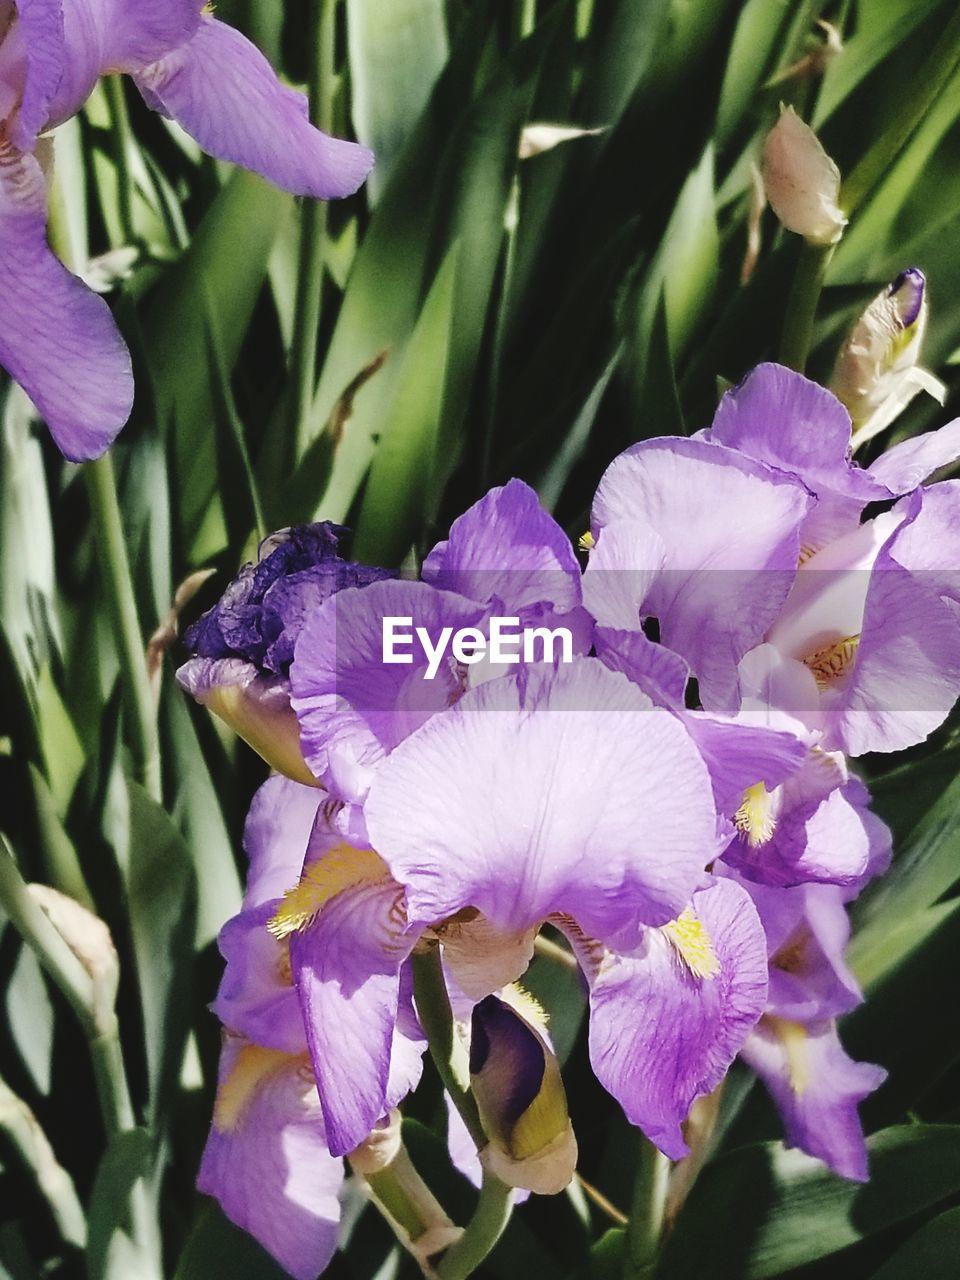 CLOSE-UP OF FRESH PURPLE IRIS FLOWERS